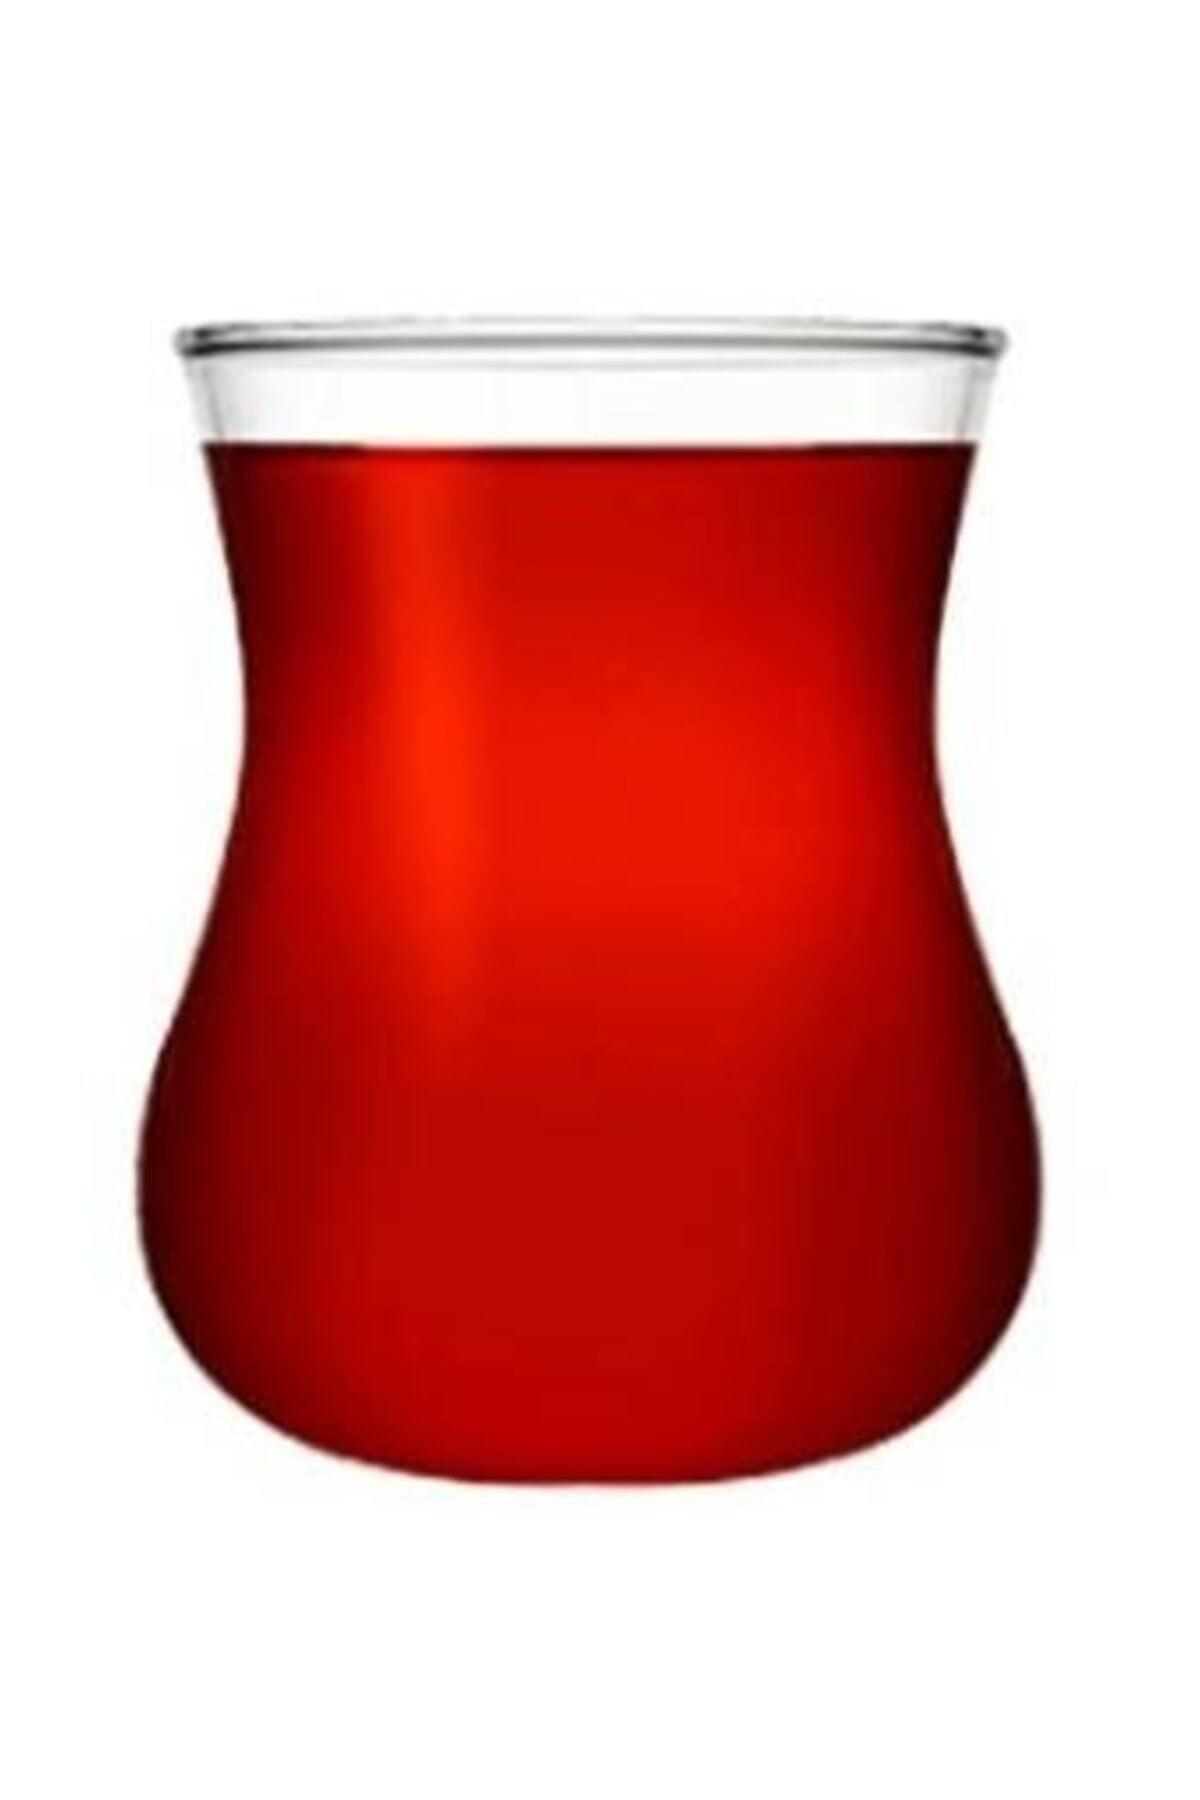 Paşabahçe Semaver Çay Bardağı 285 Cc 42801 - 6 Adet 1